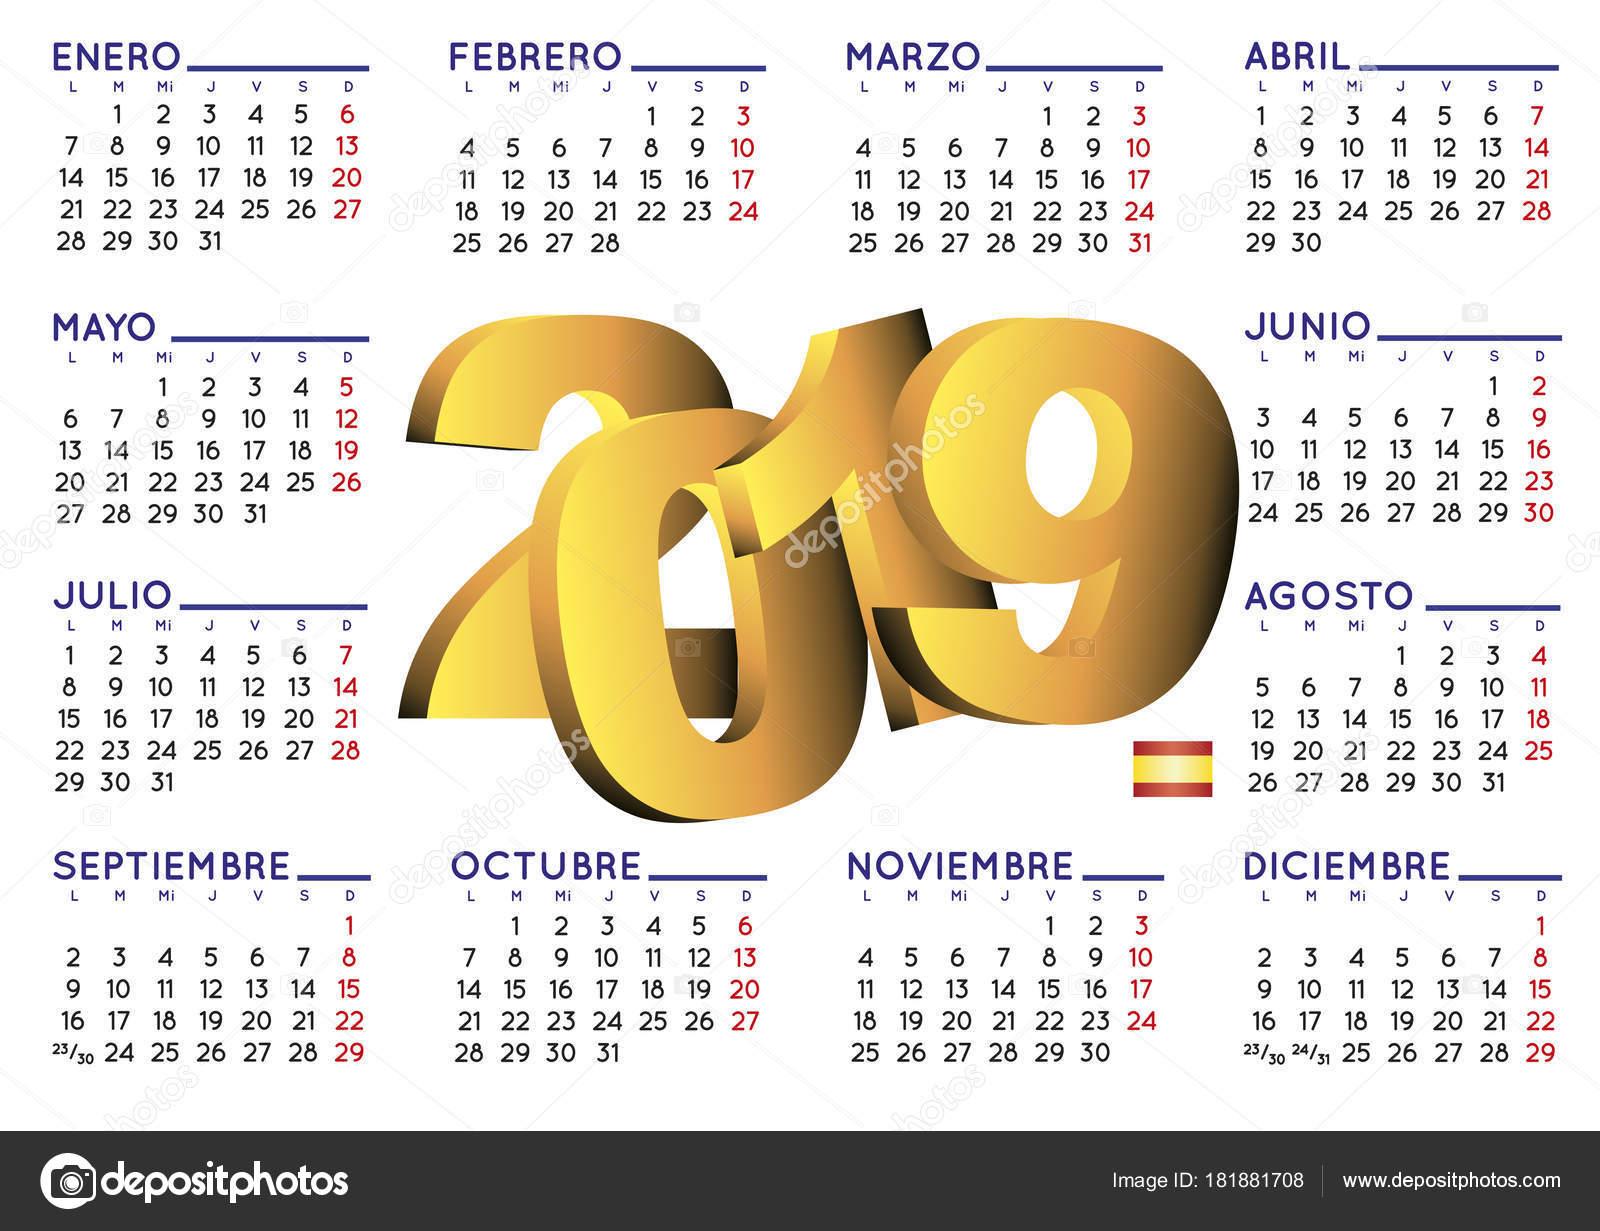 Calendario In Spagnolo.2019 Calendario In Spagnolo Orizzontale Vettoriali Stock